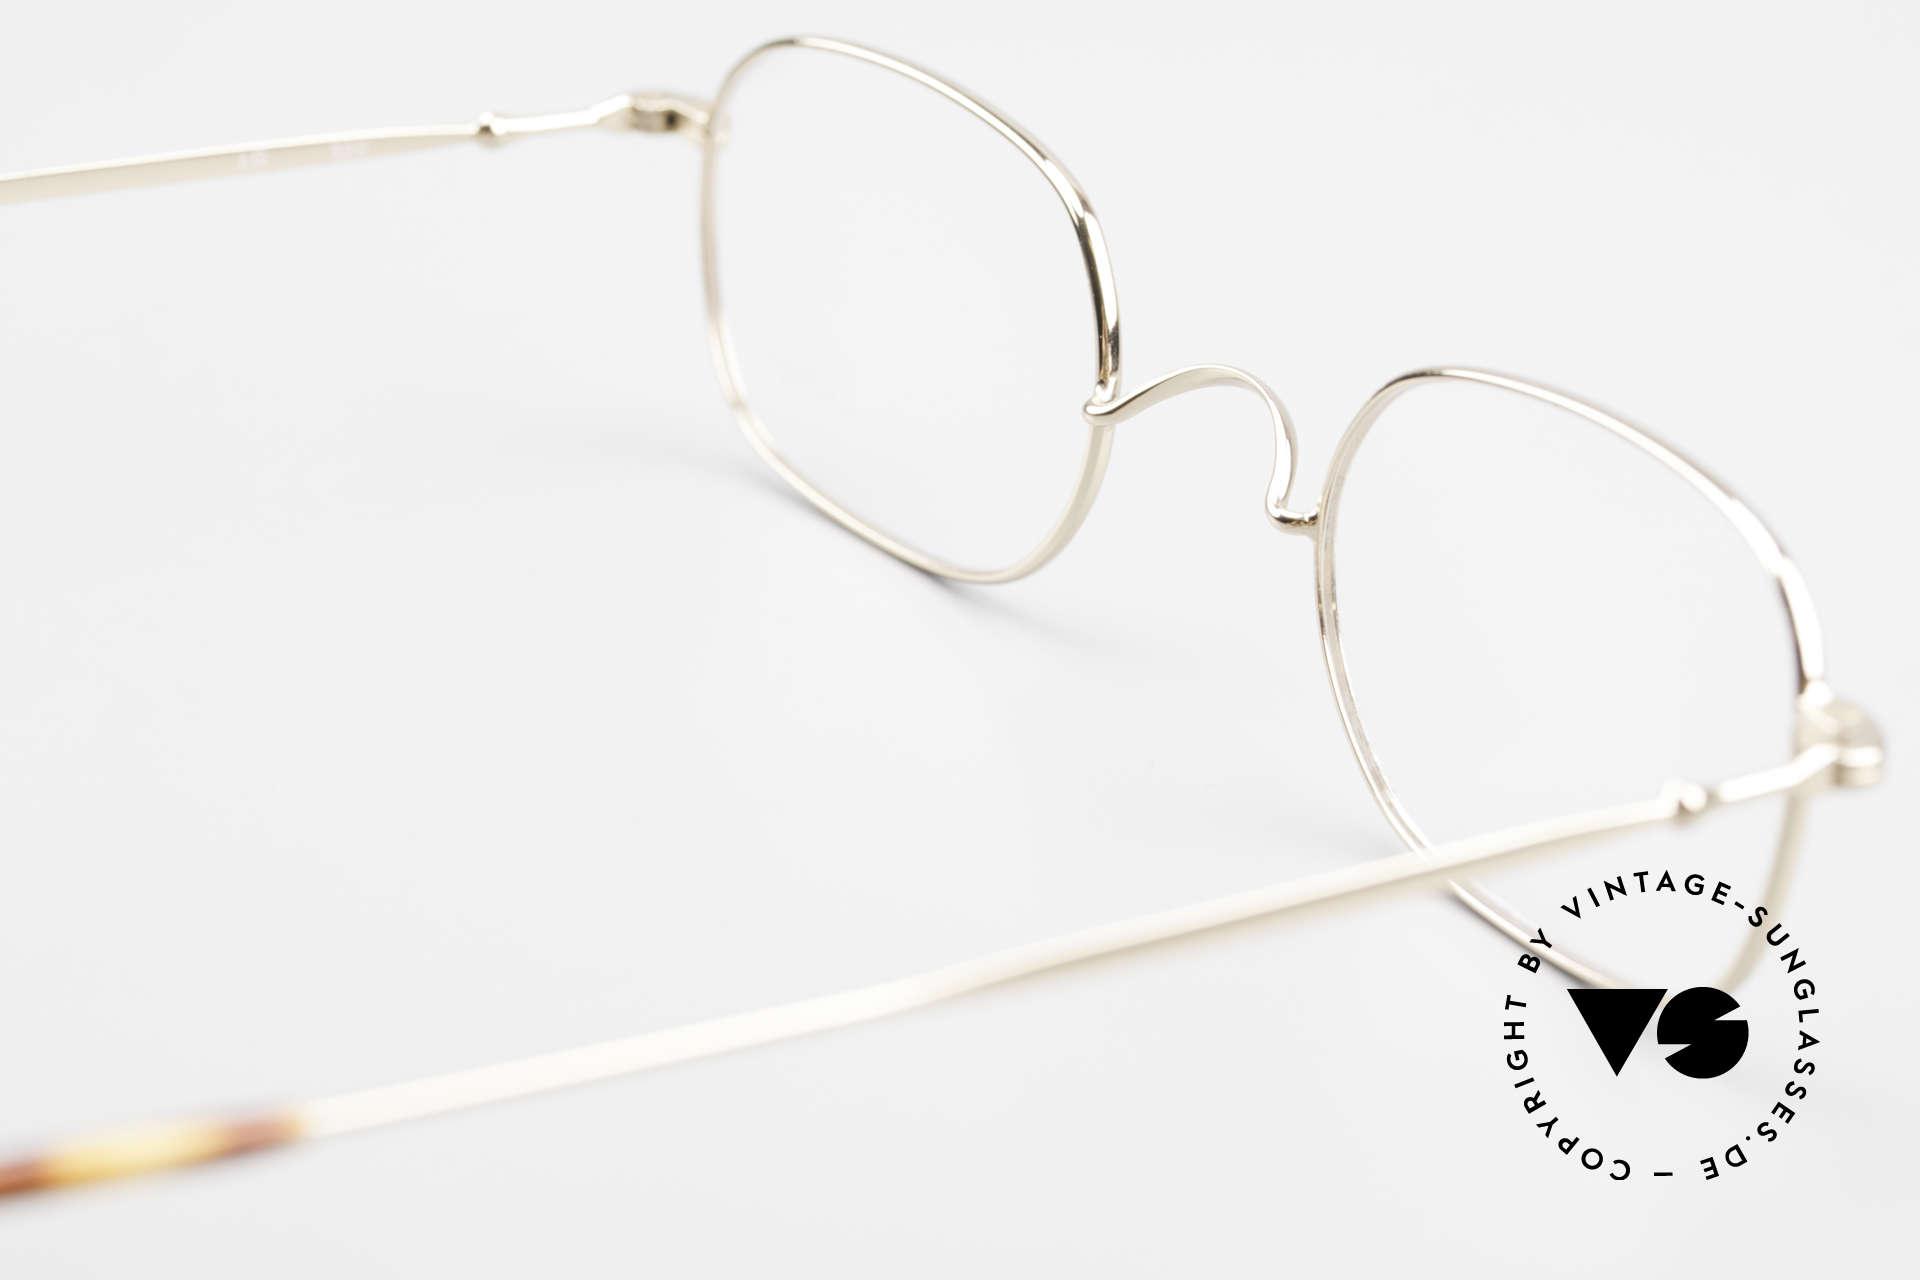 Lunor 322 Classic Vintage Eyeglasses 90s, NO RETRO EYEGLASSES; but a luxury vintage ORIGINAL, Made for Men and Women